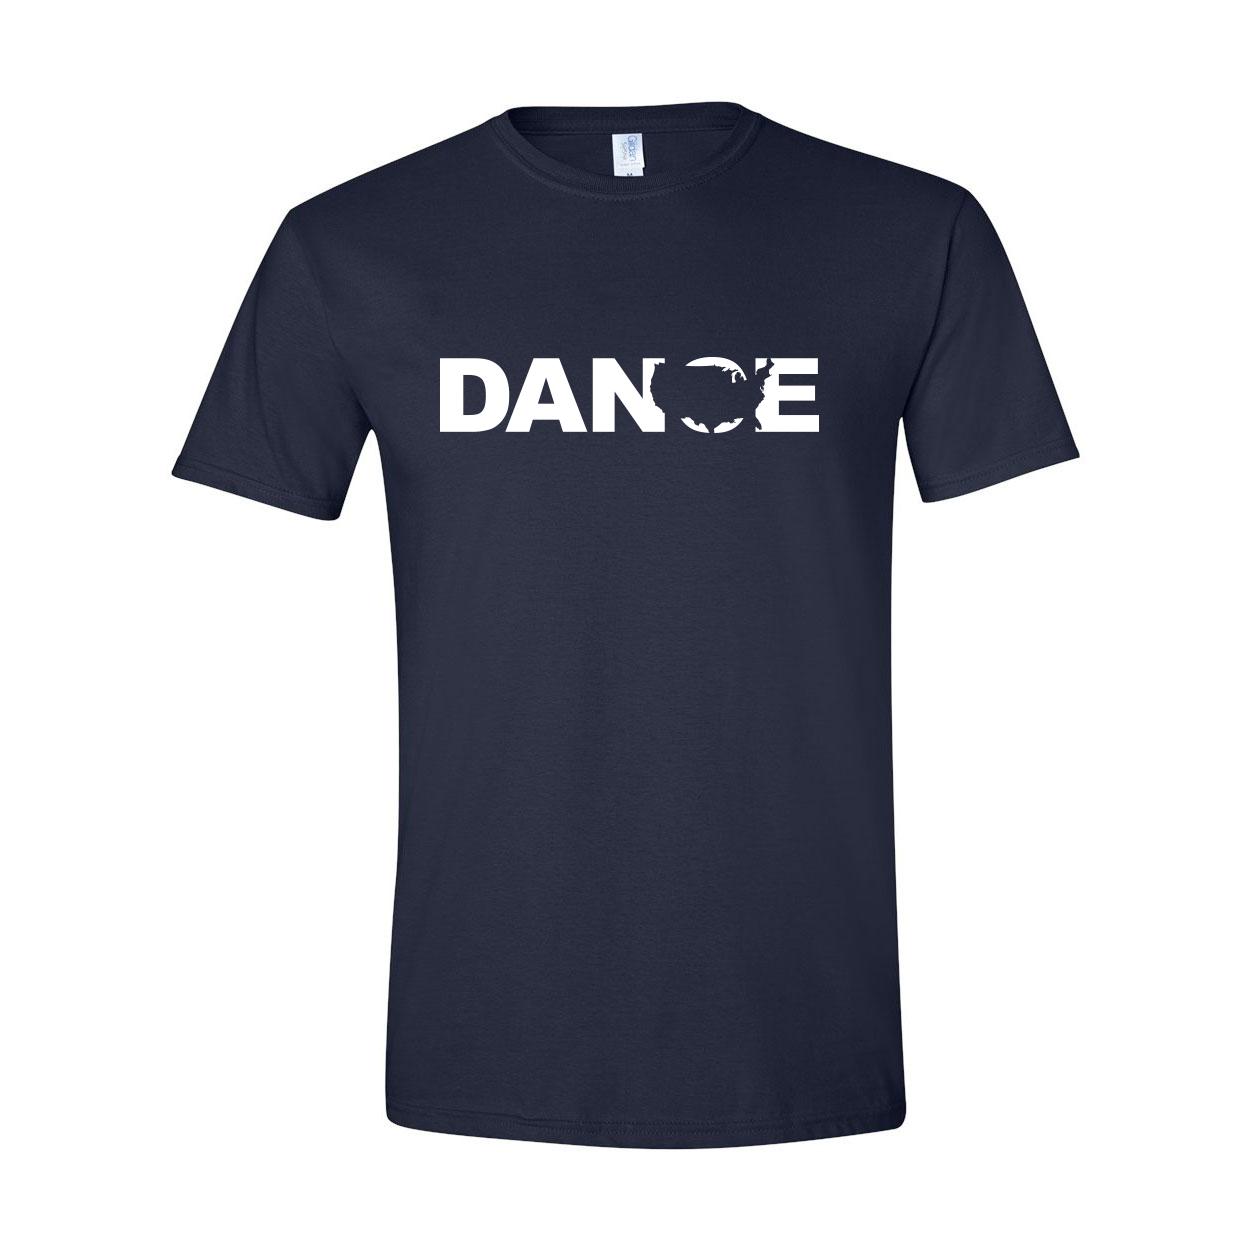 Dance United States Classic T-Shirt Navy (White Logo)